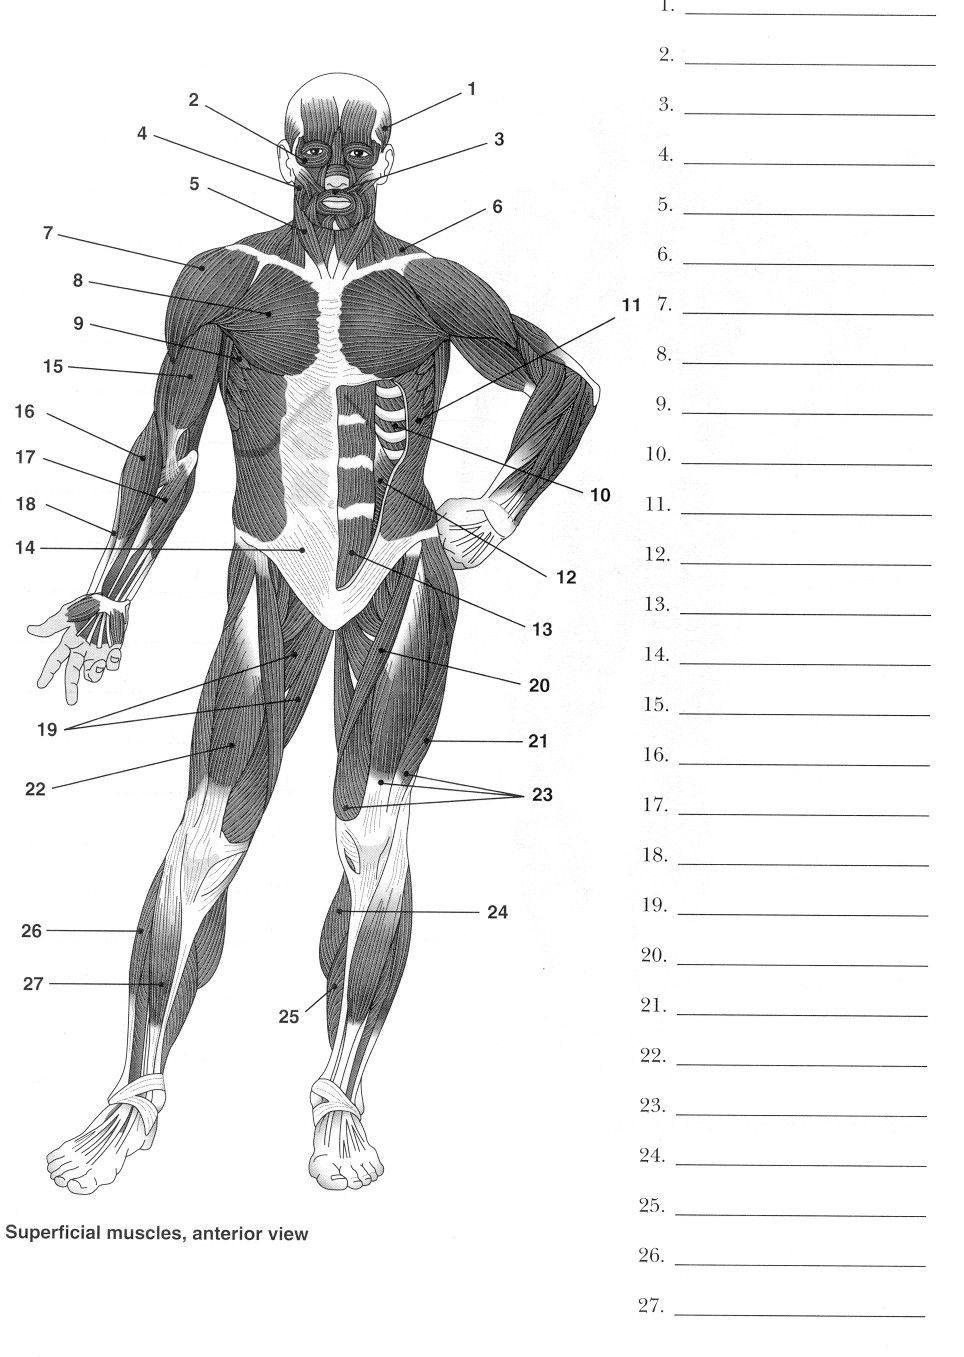 Muscular System Diagram Blank Koibana Info Human Muscle Anatomy Human Body Worksheets Human Anatomy Systems